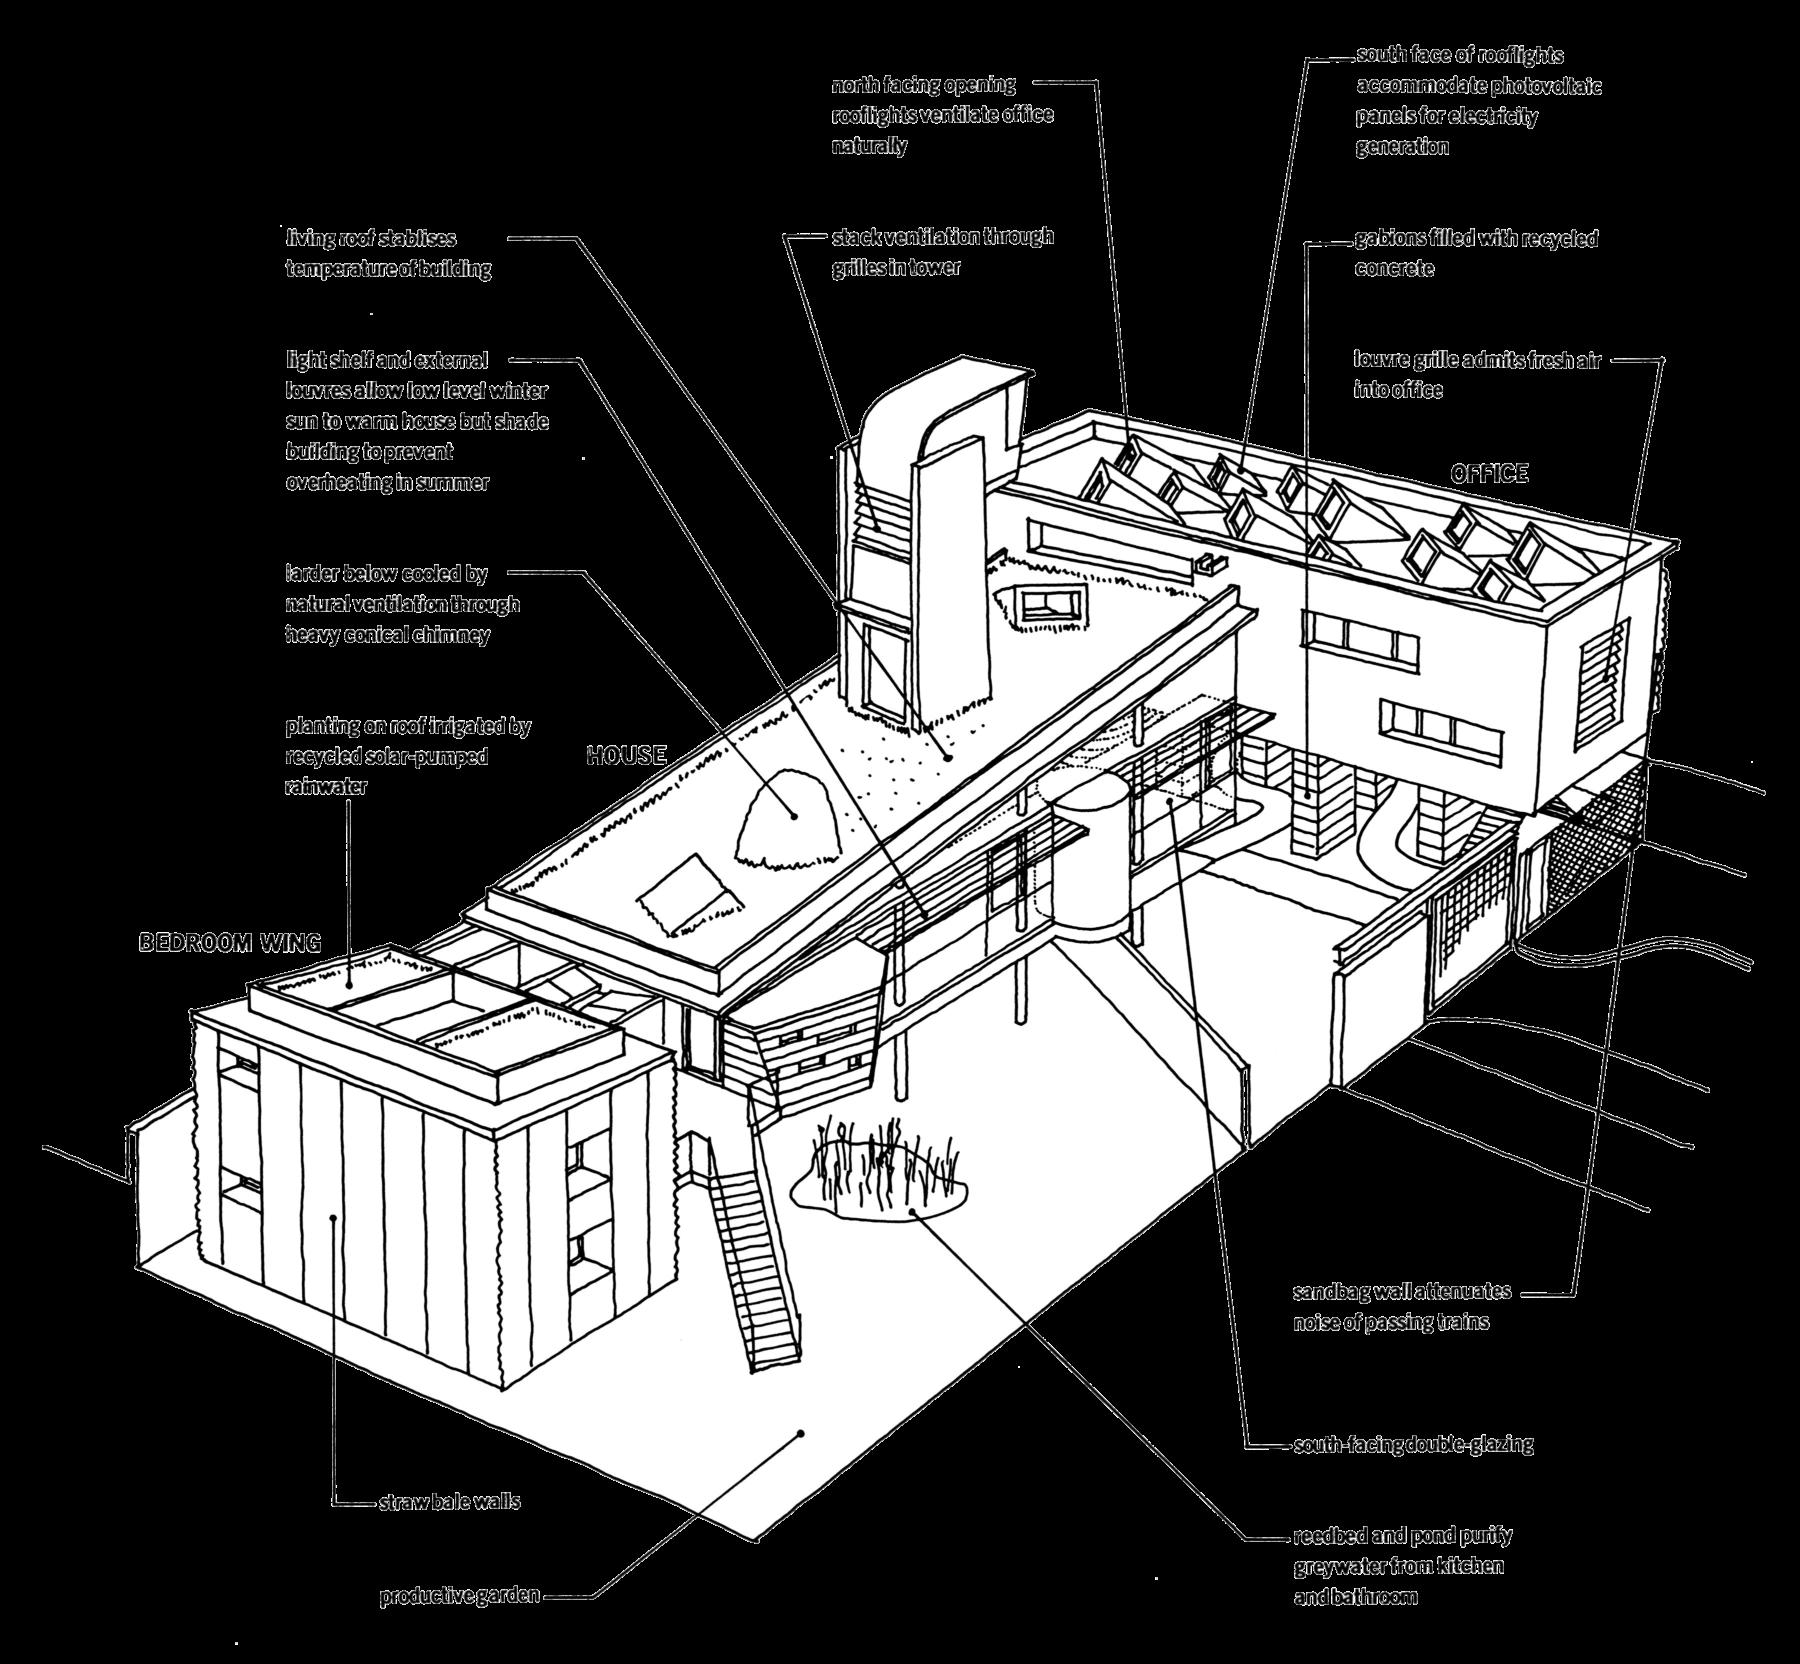 Sarah-Wigglesworth-Architects Stock-Orchard axonometric 3600